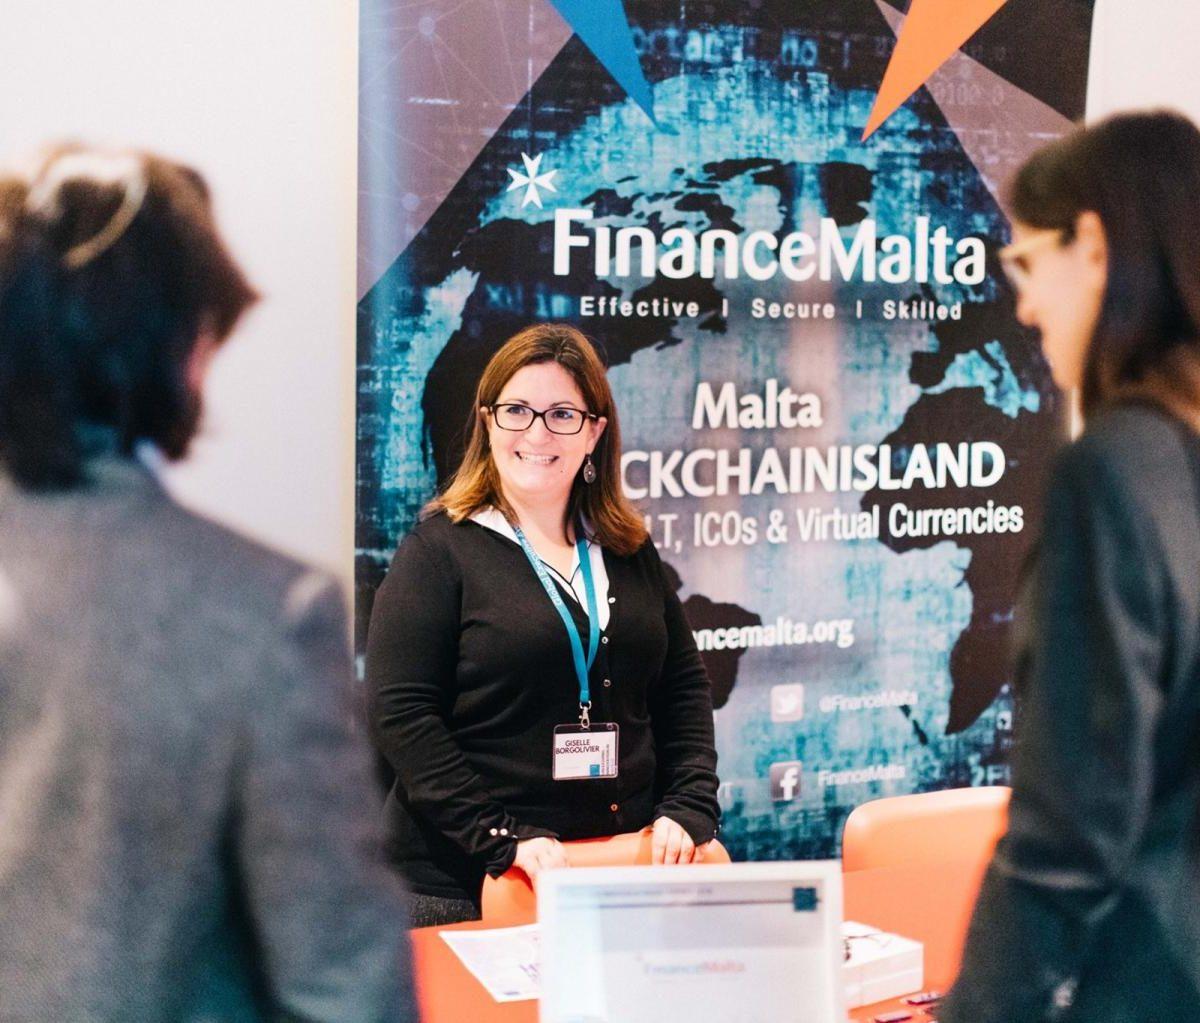 FinanceMalta kicks off Amsterdam Fintech innovation summit